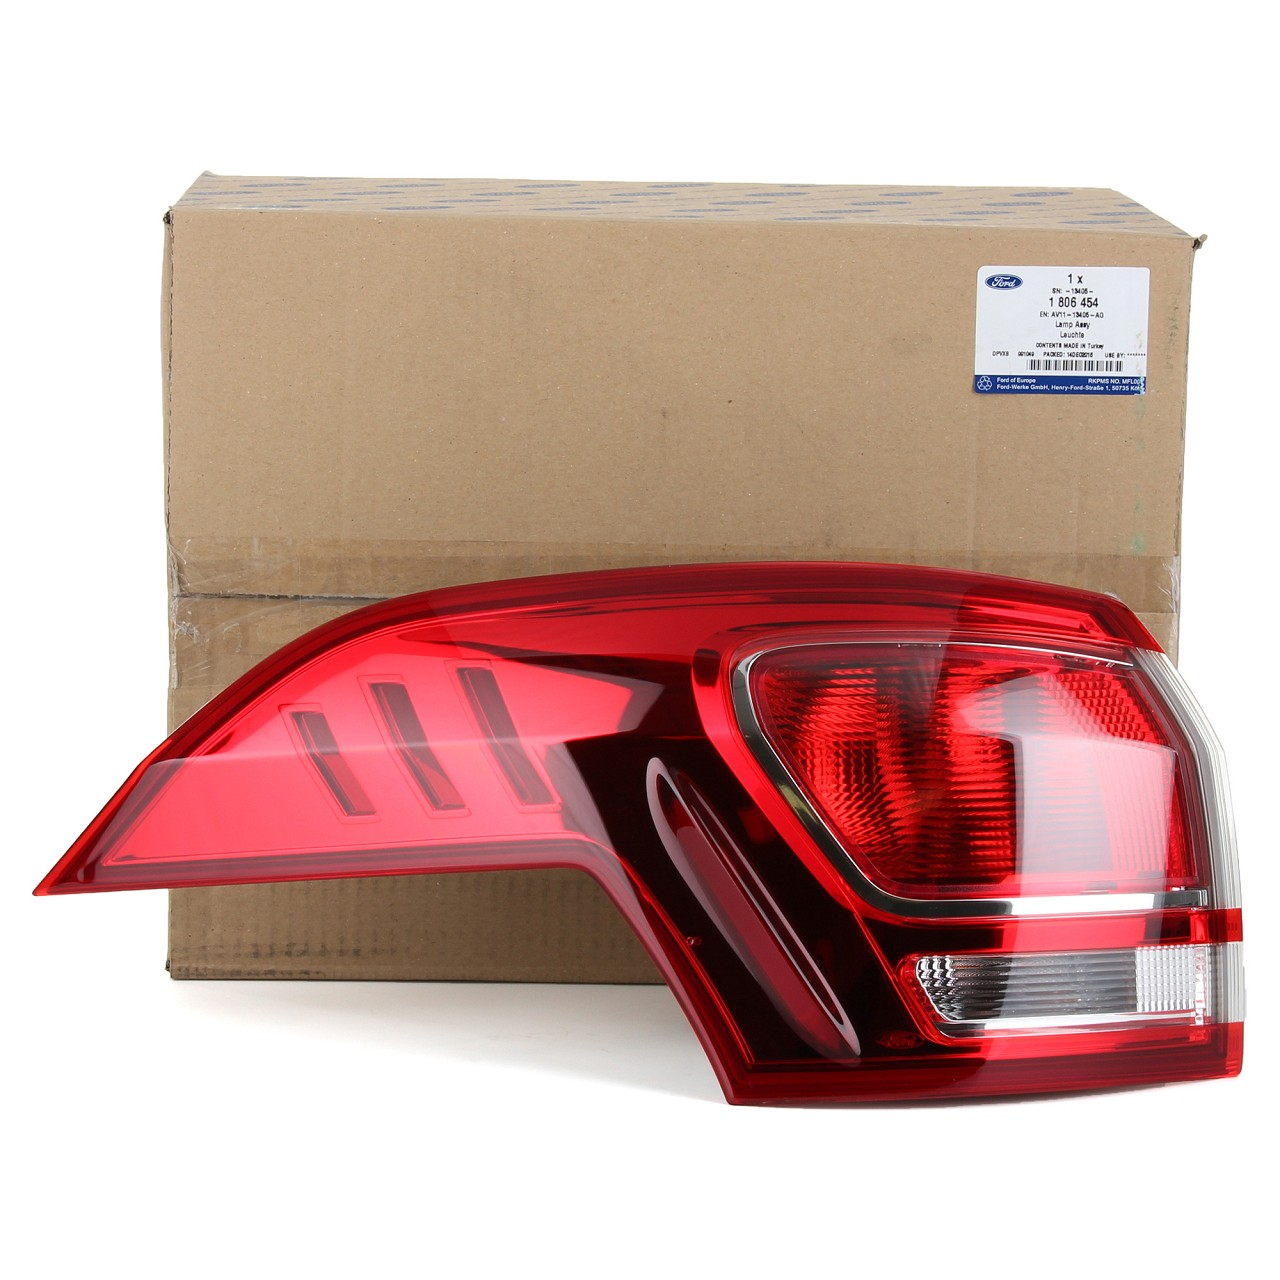 ORIGINAL Ford Heckleuchte Rückleuchte Rücklicht B-MAX (JK) aussen links 1806454